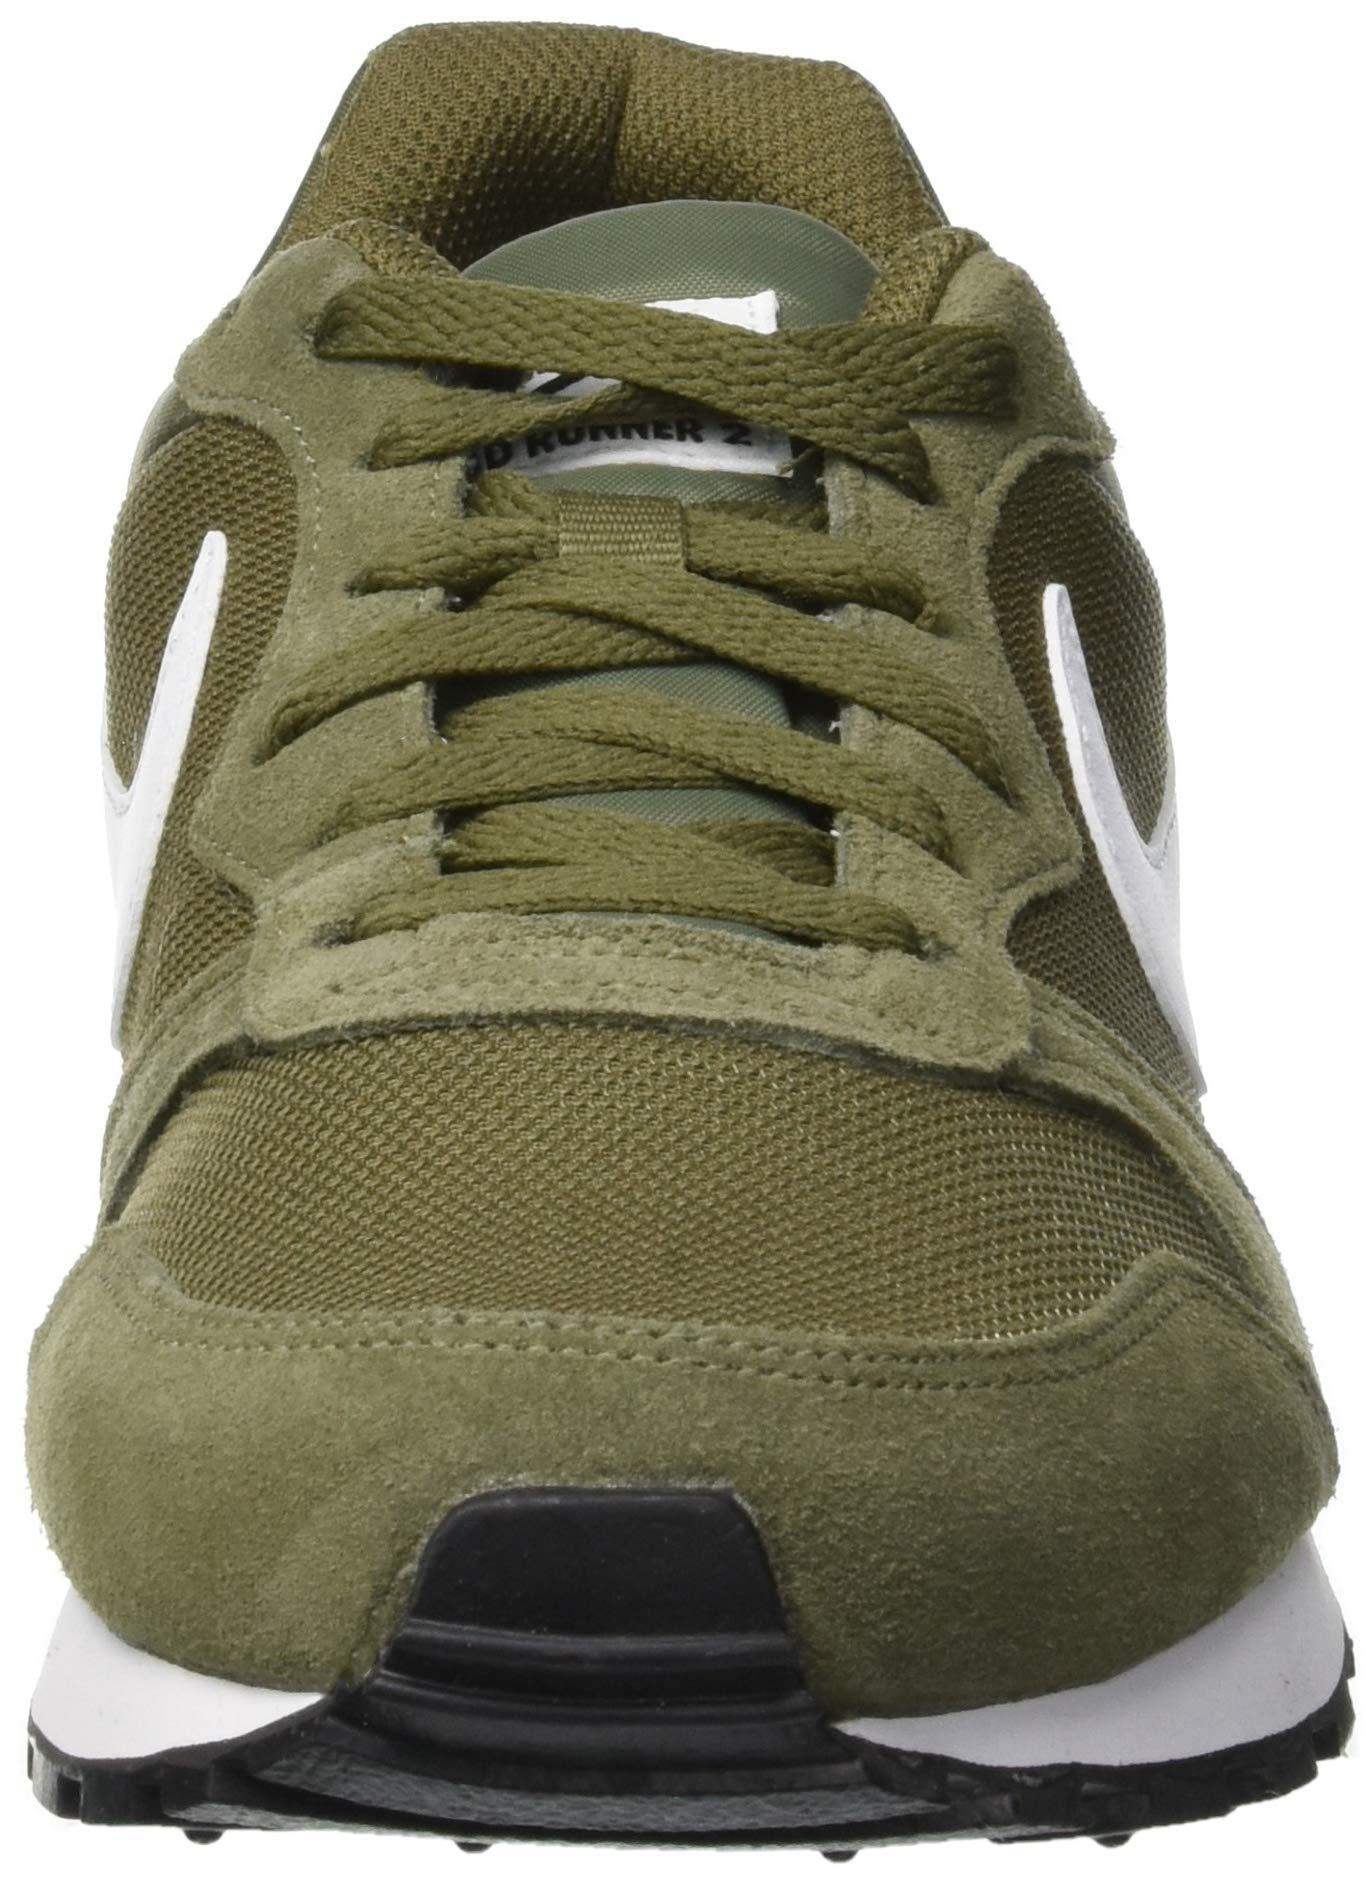 Nike MD Runner 2, Zapatillas de Running Hombre, EU